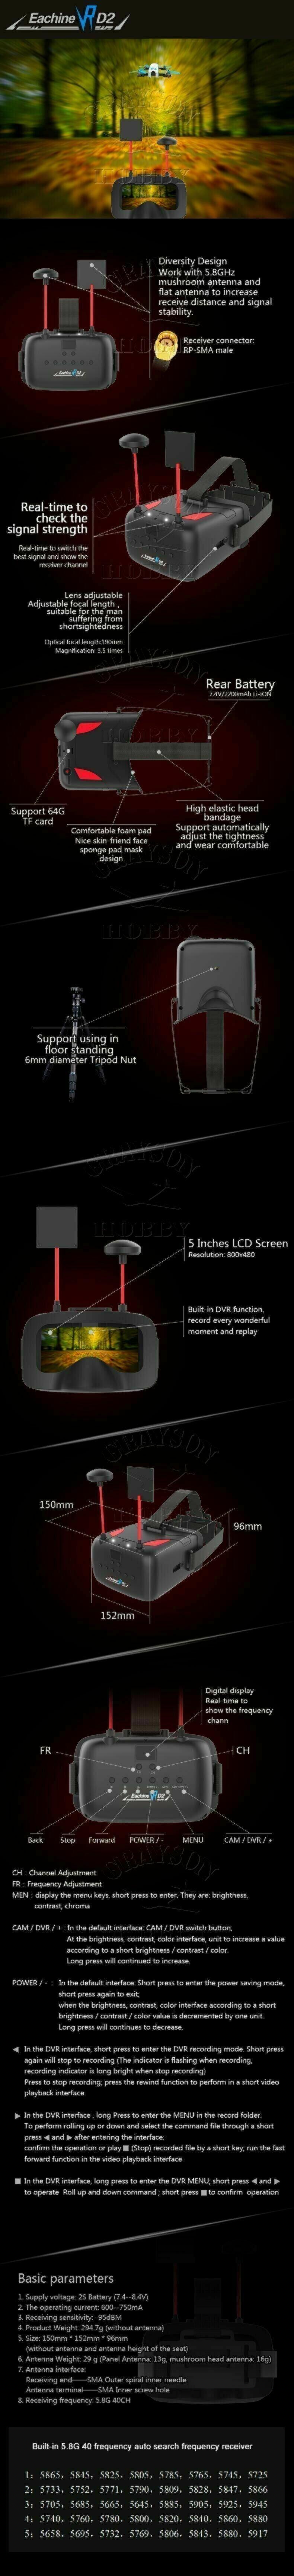 Eachine VR-D2 - FPV Goggle